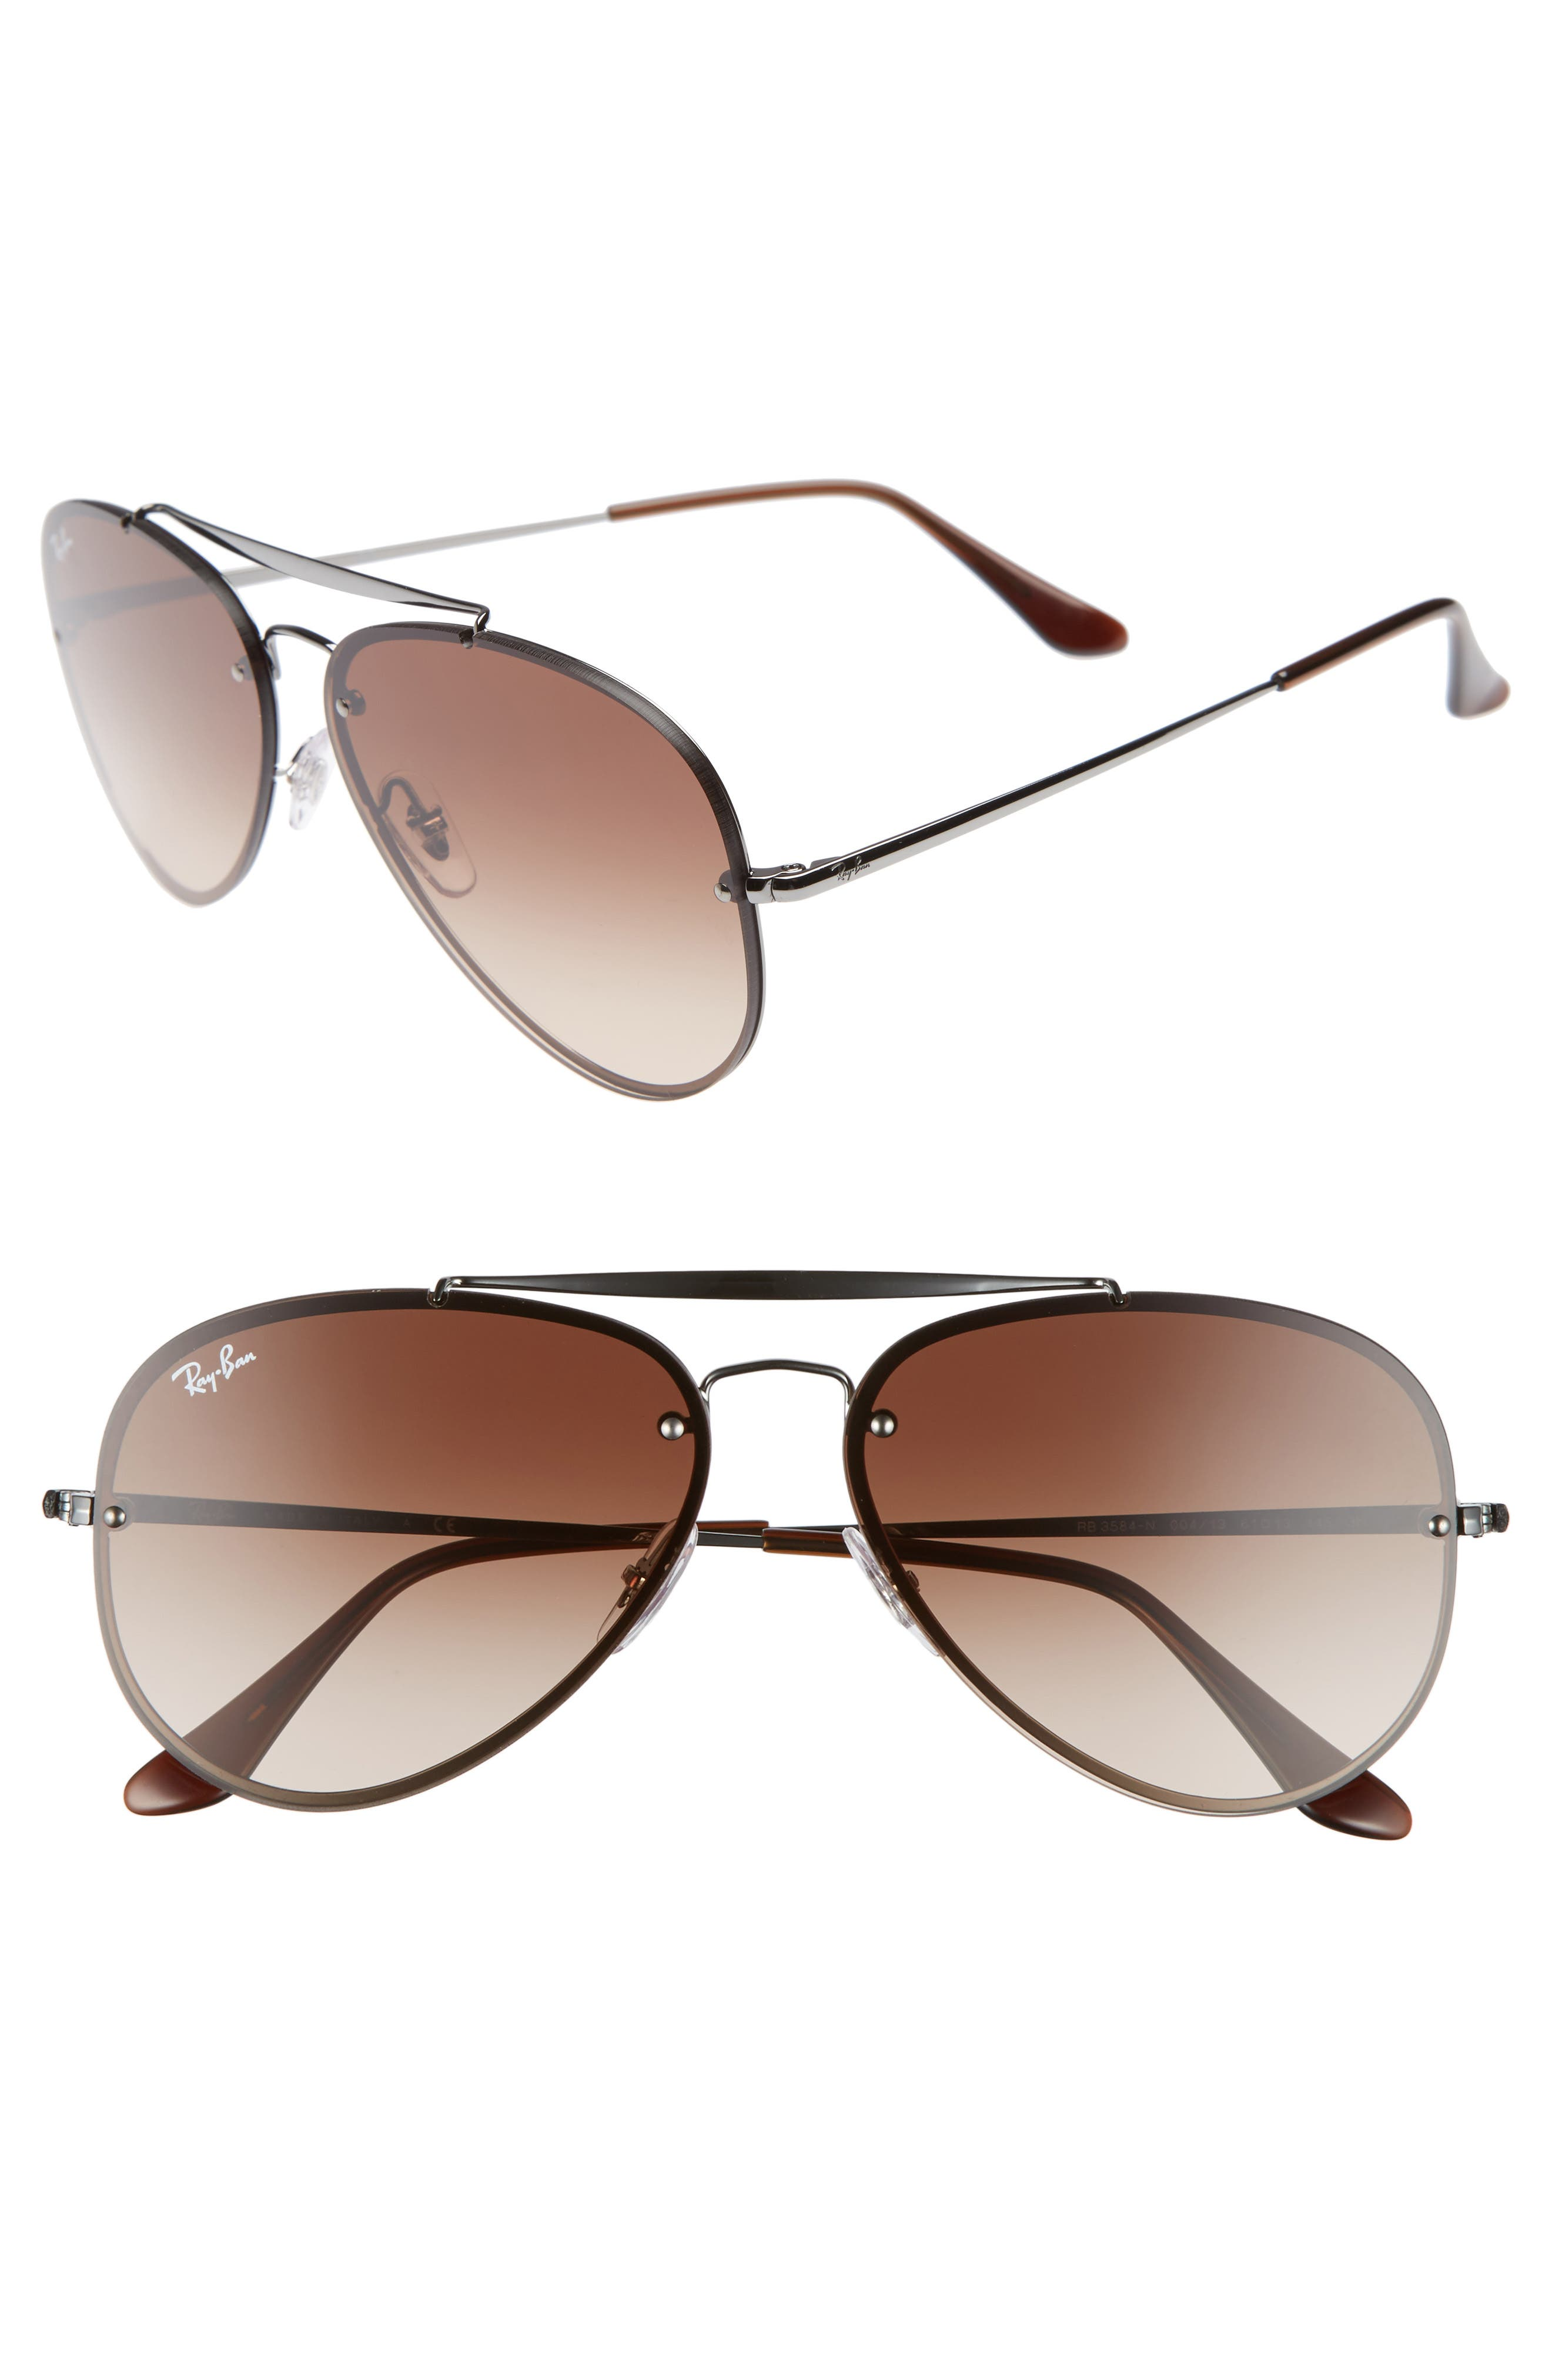 Blaze 61mm Aviator Sunglasses,                             Main thumbnail 1, color,                             026